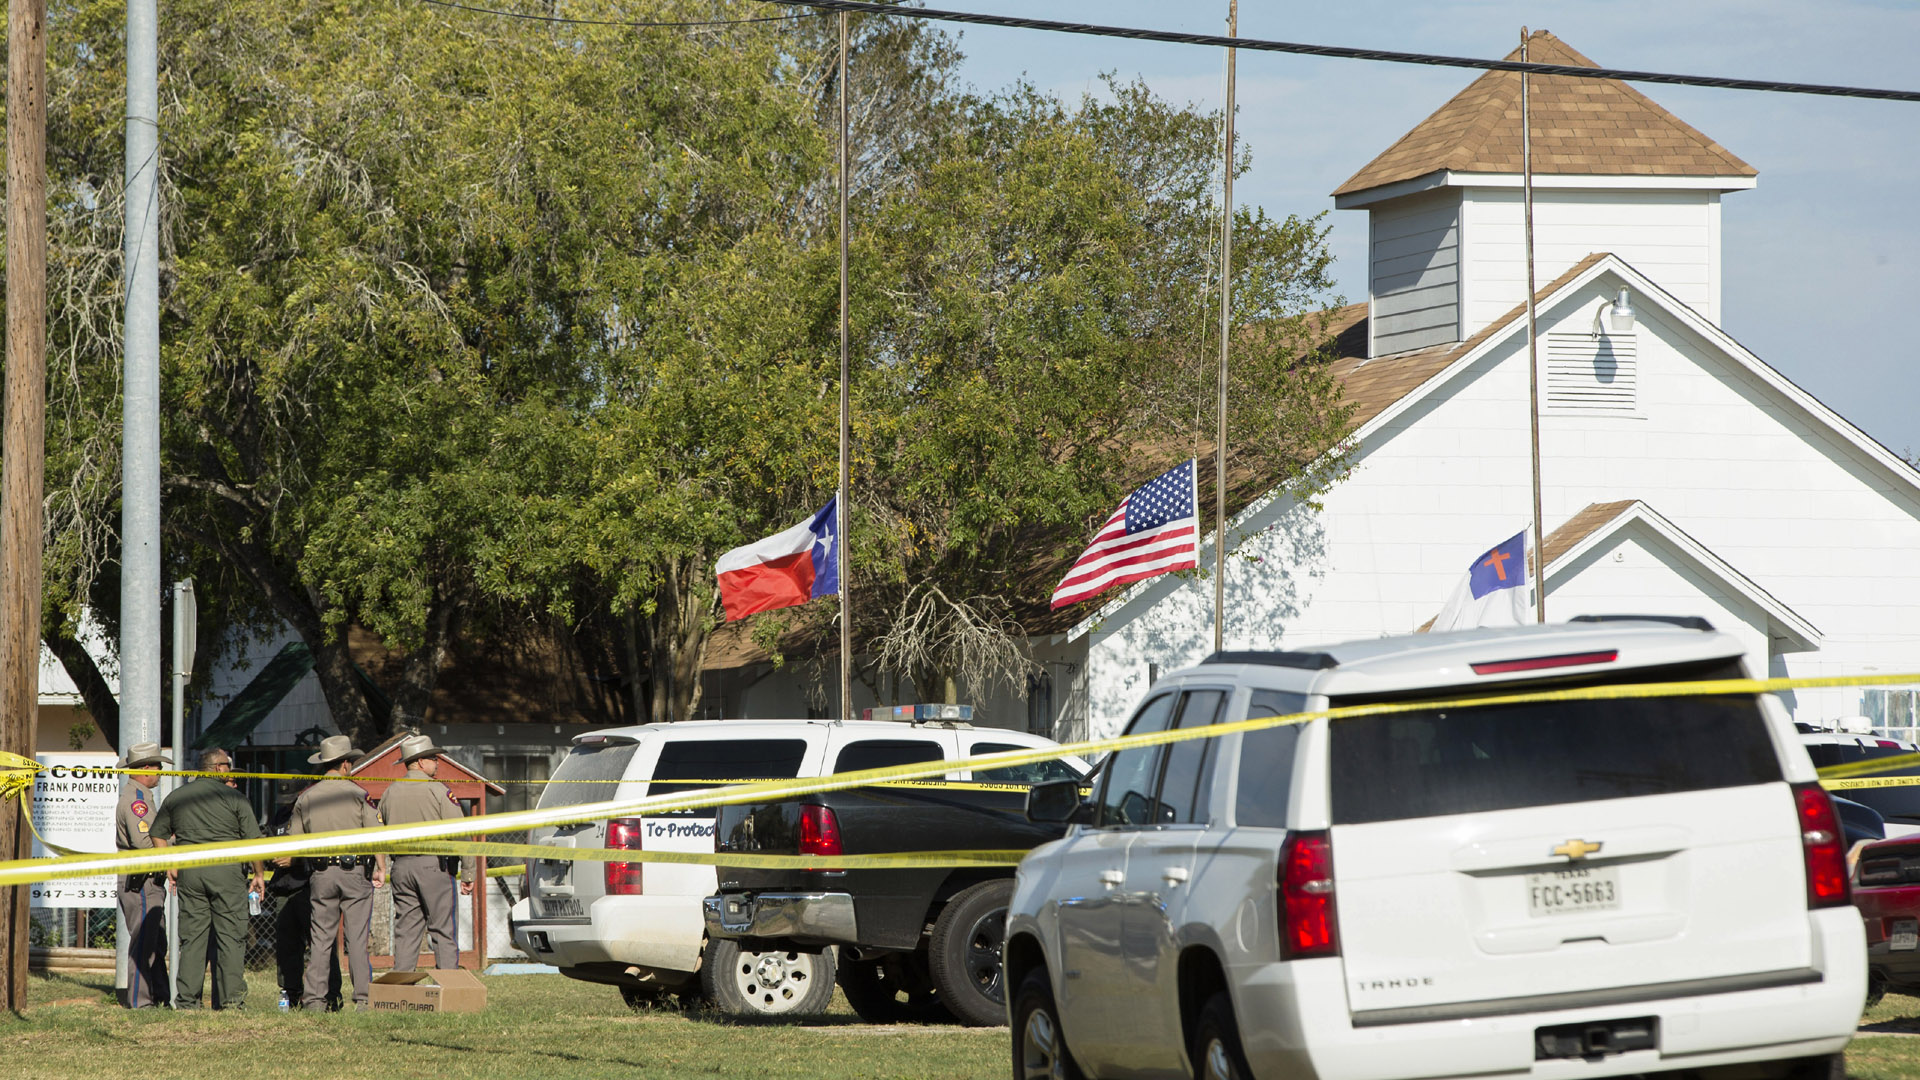 Texas church shooting, shot of scene, Sutherland Springs, First Baptist Church53826118-159532